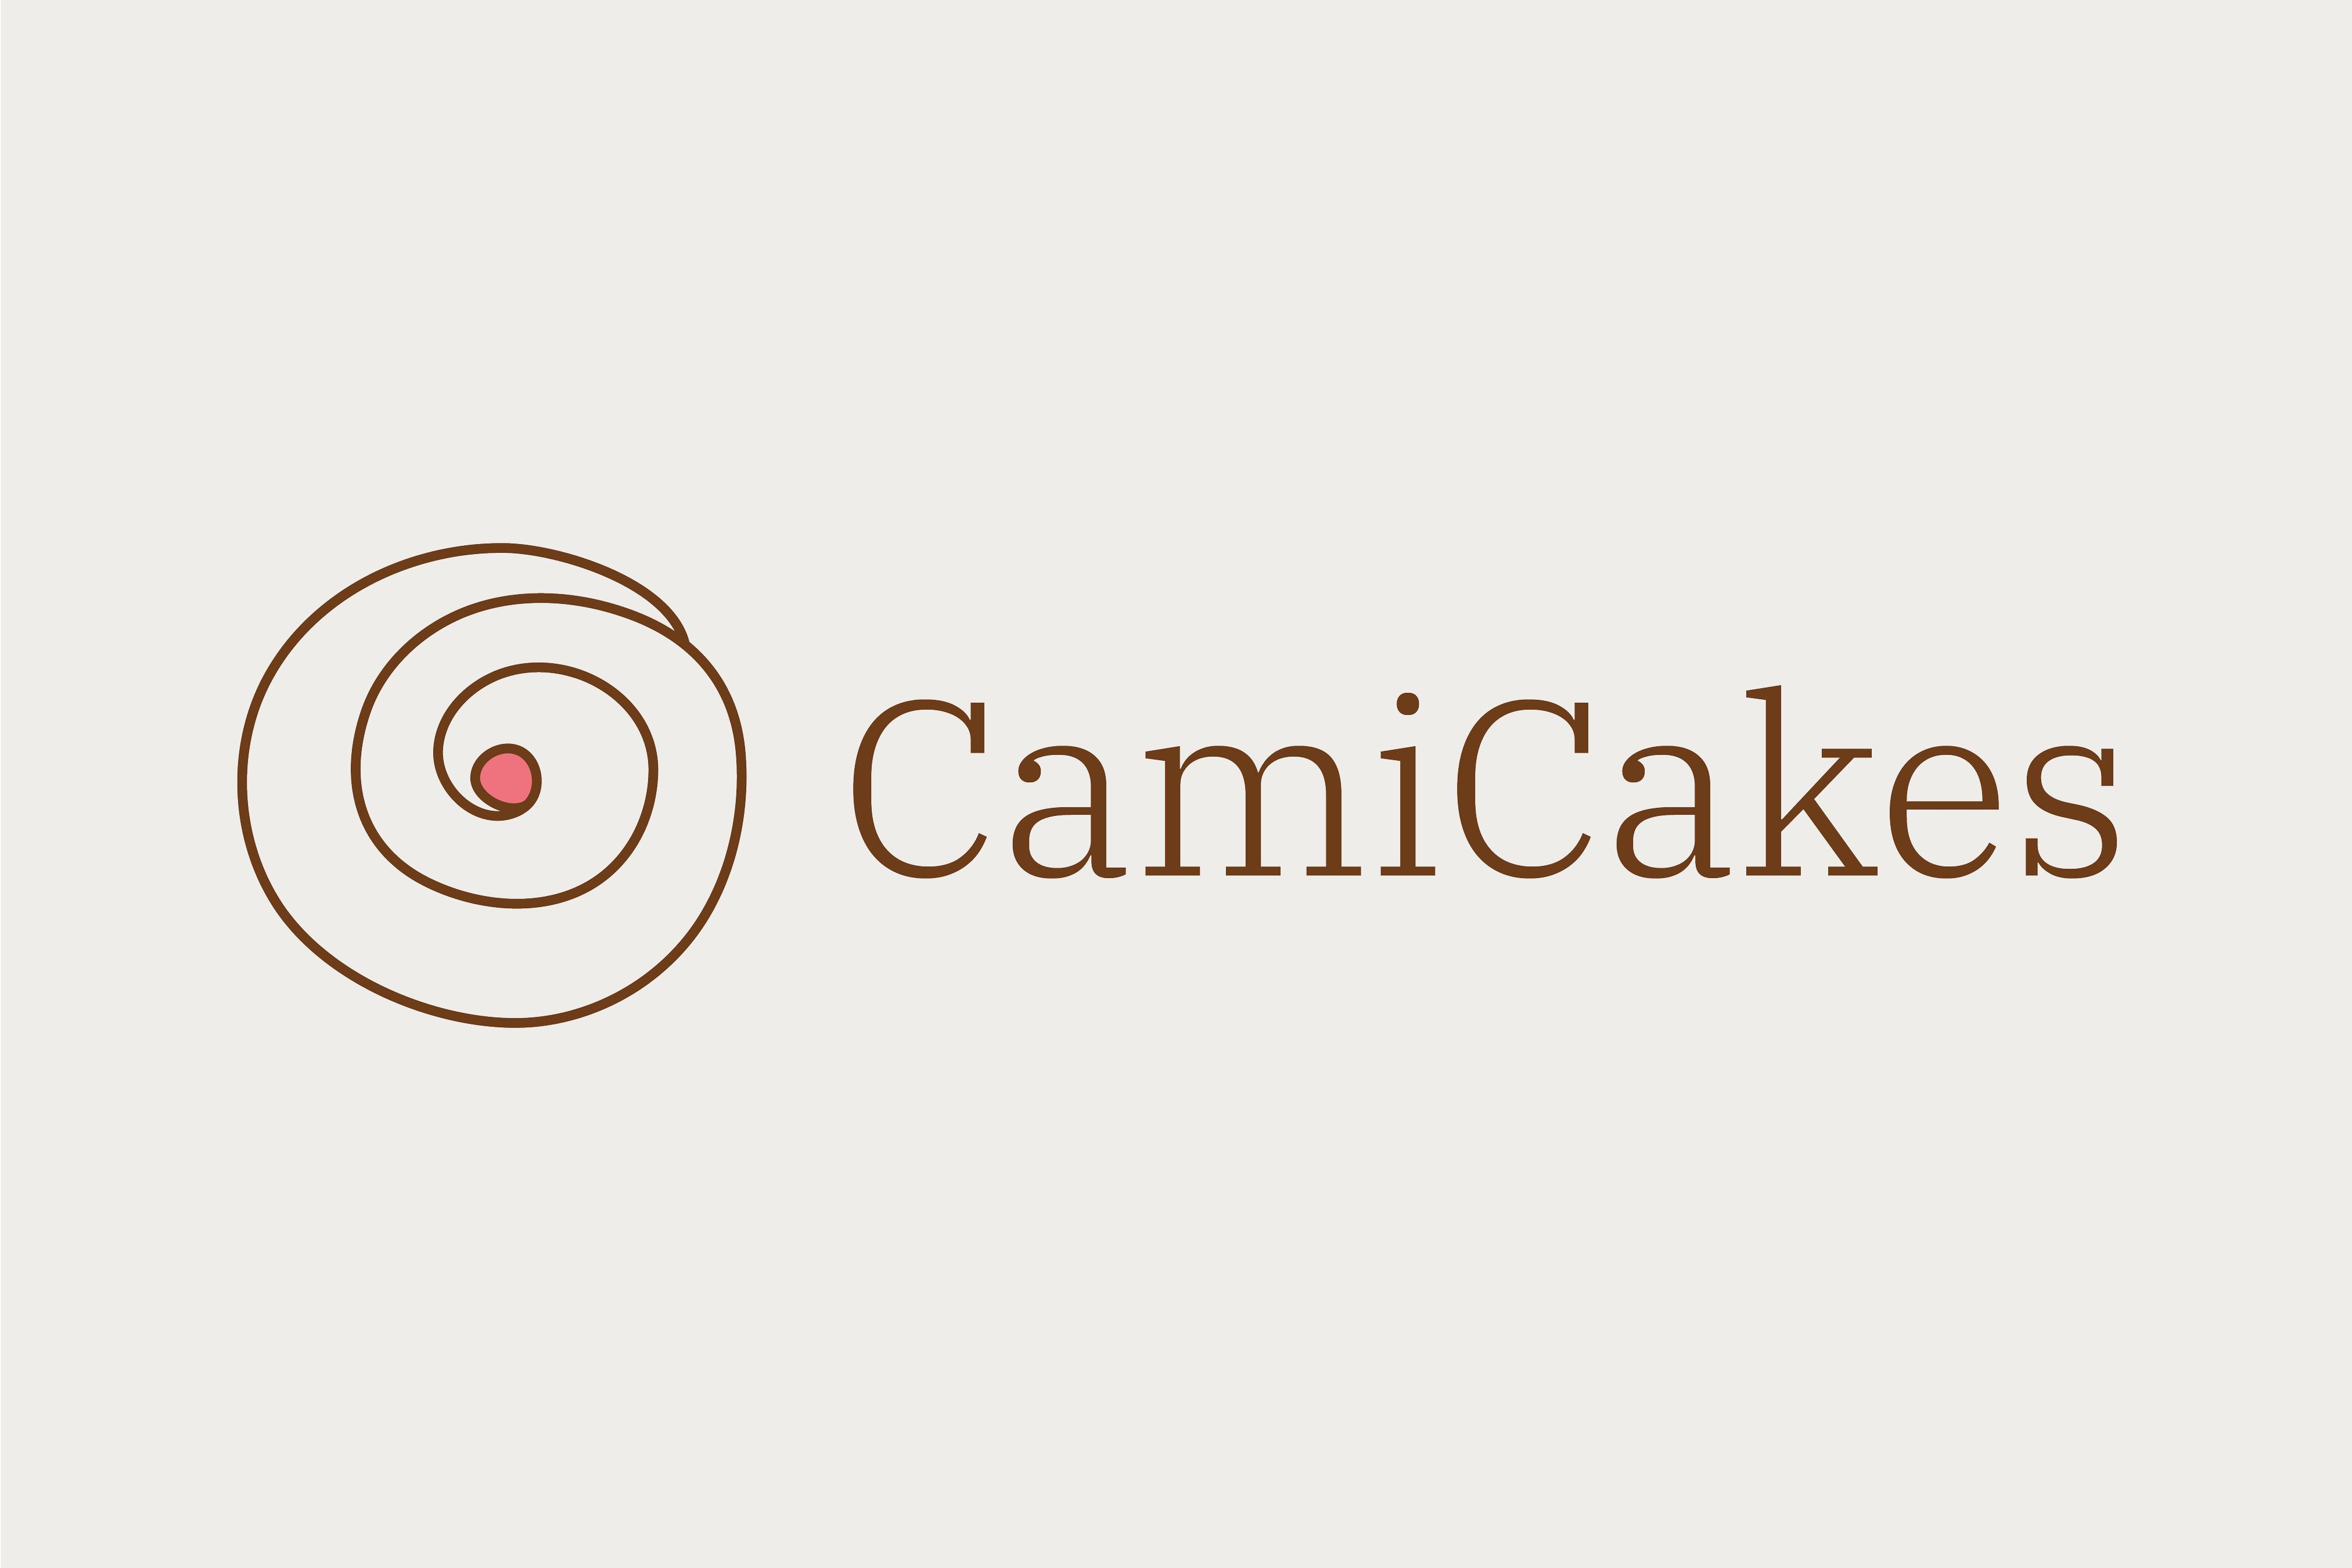 CamiCakes: Rebranding